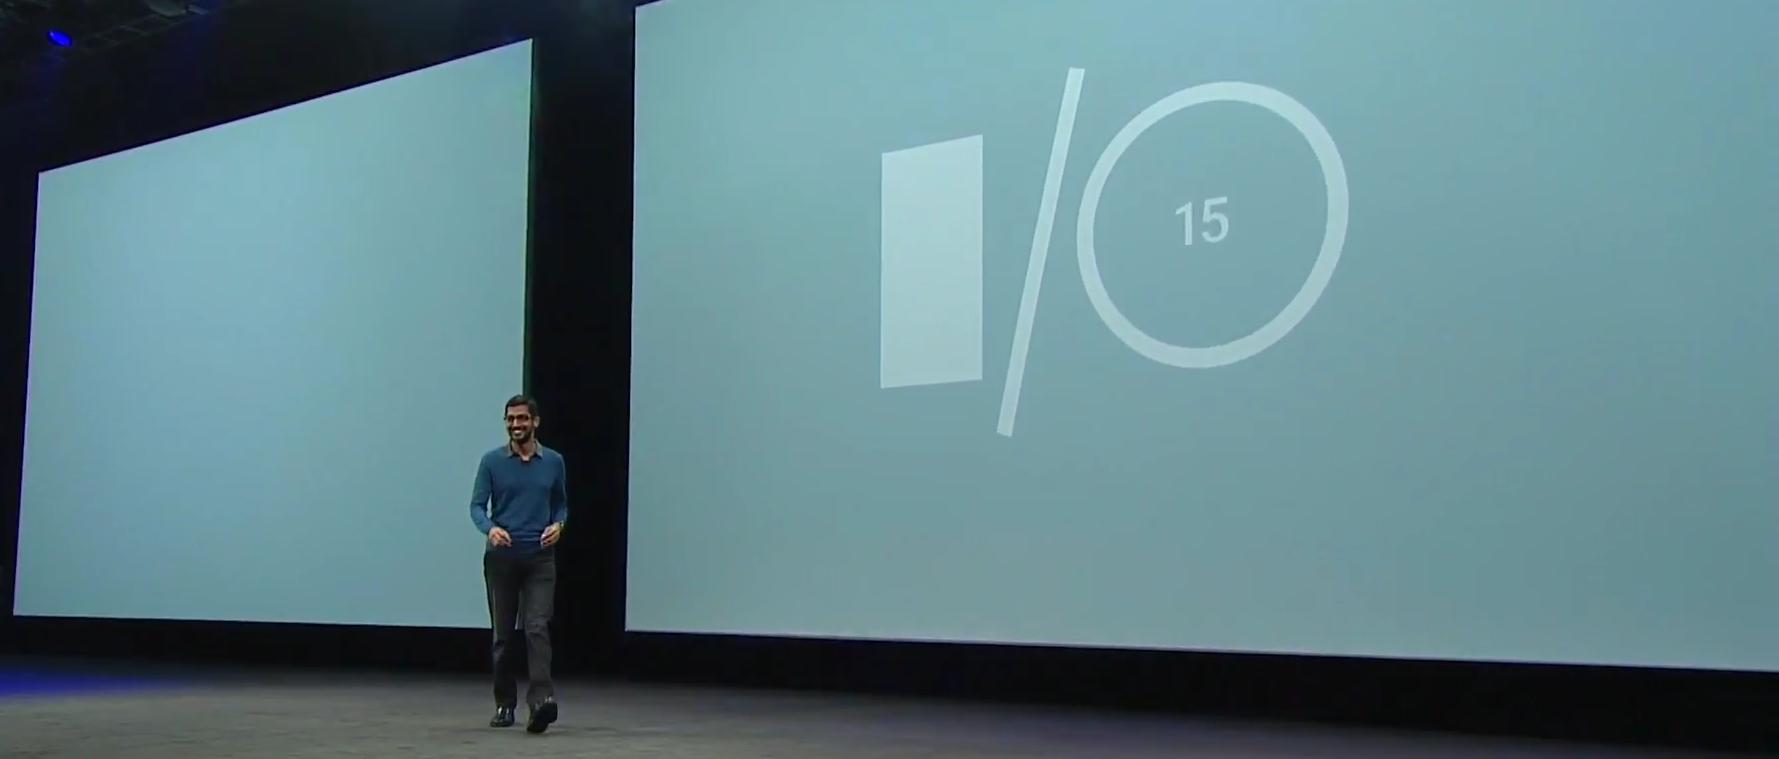 Google I/O 2015 | Photo by: Google Developers / YouTube